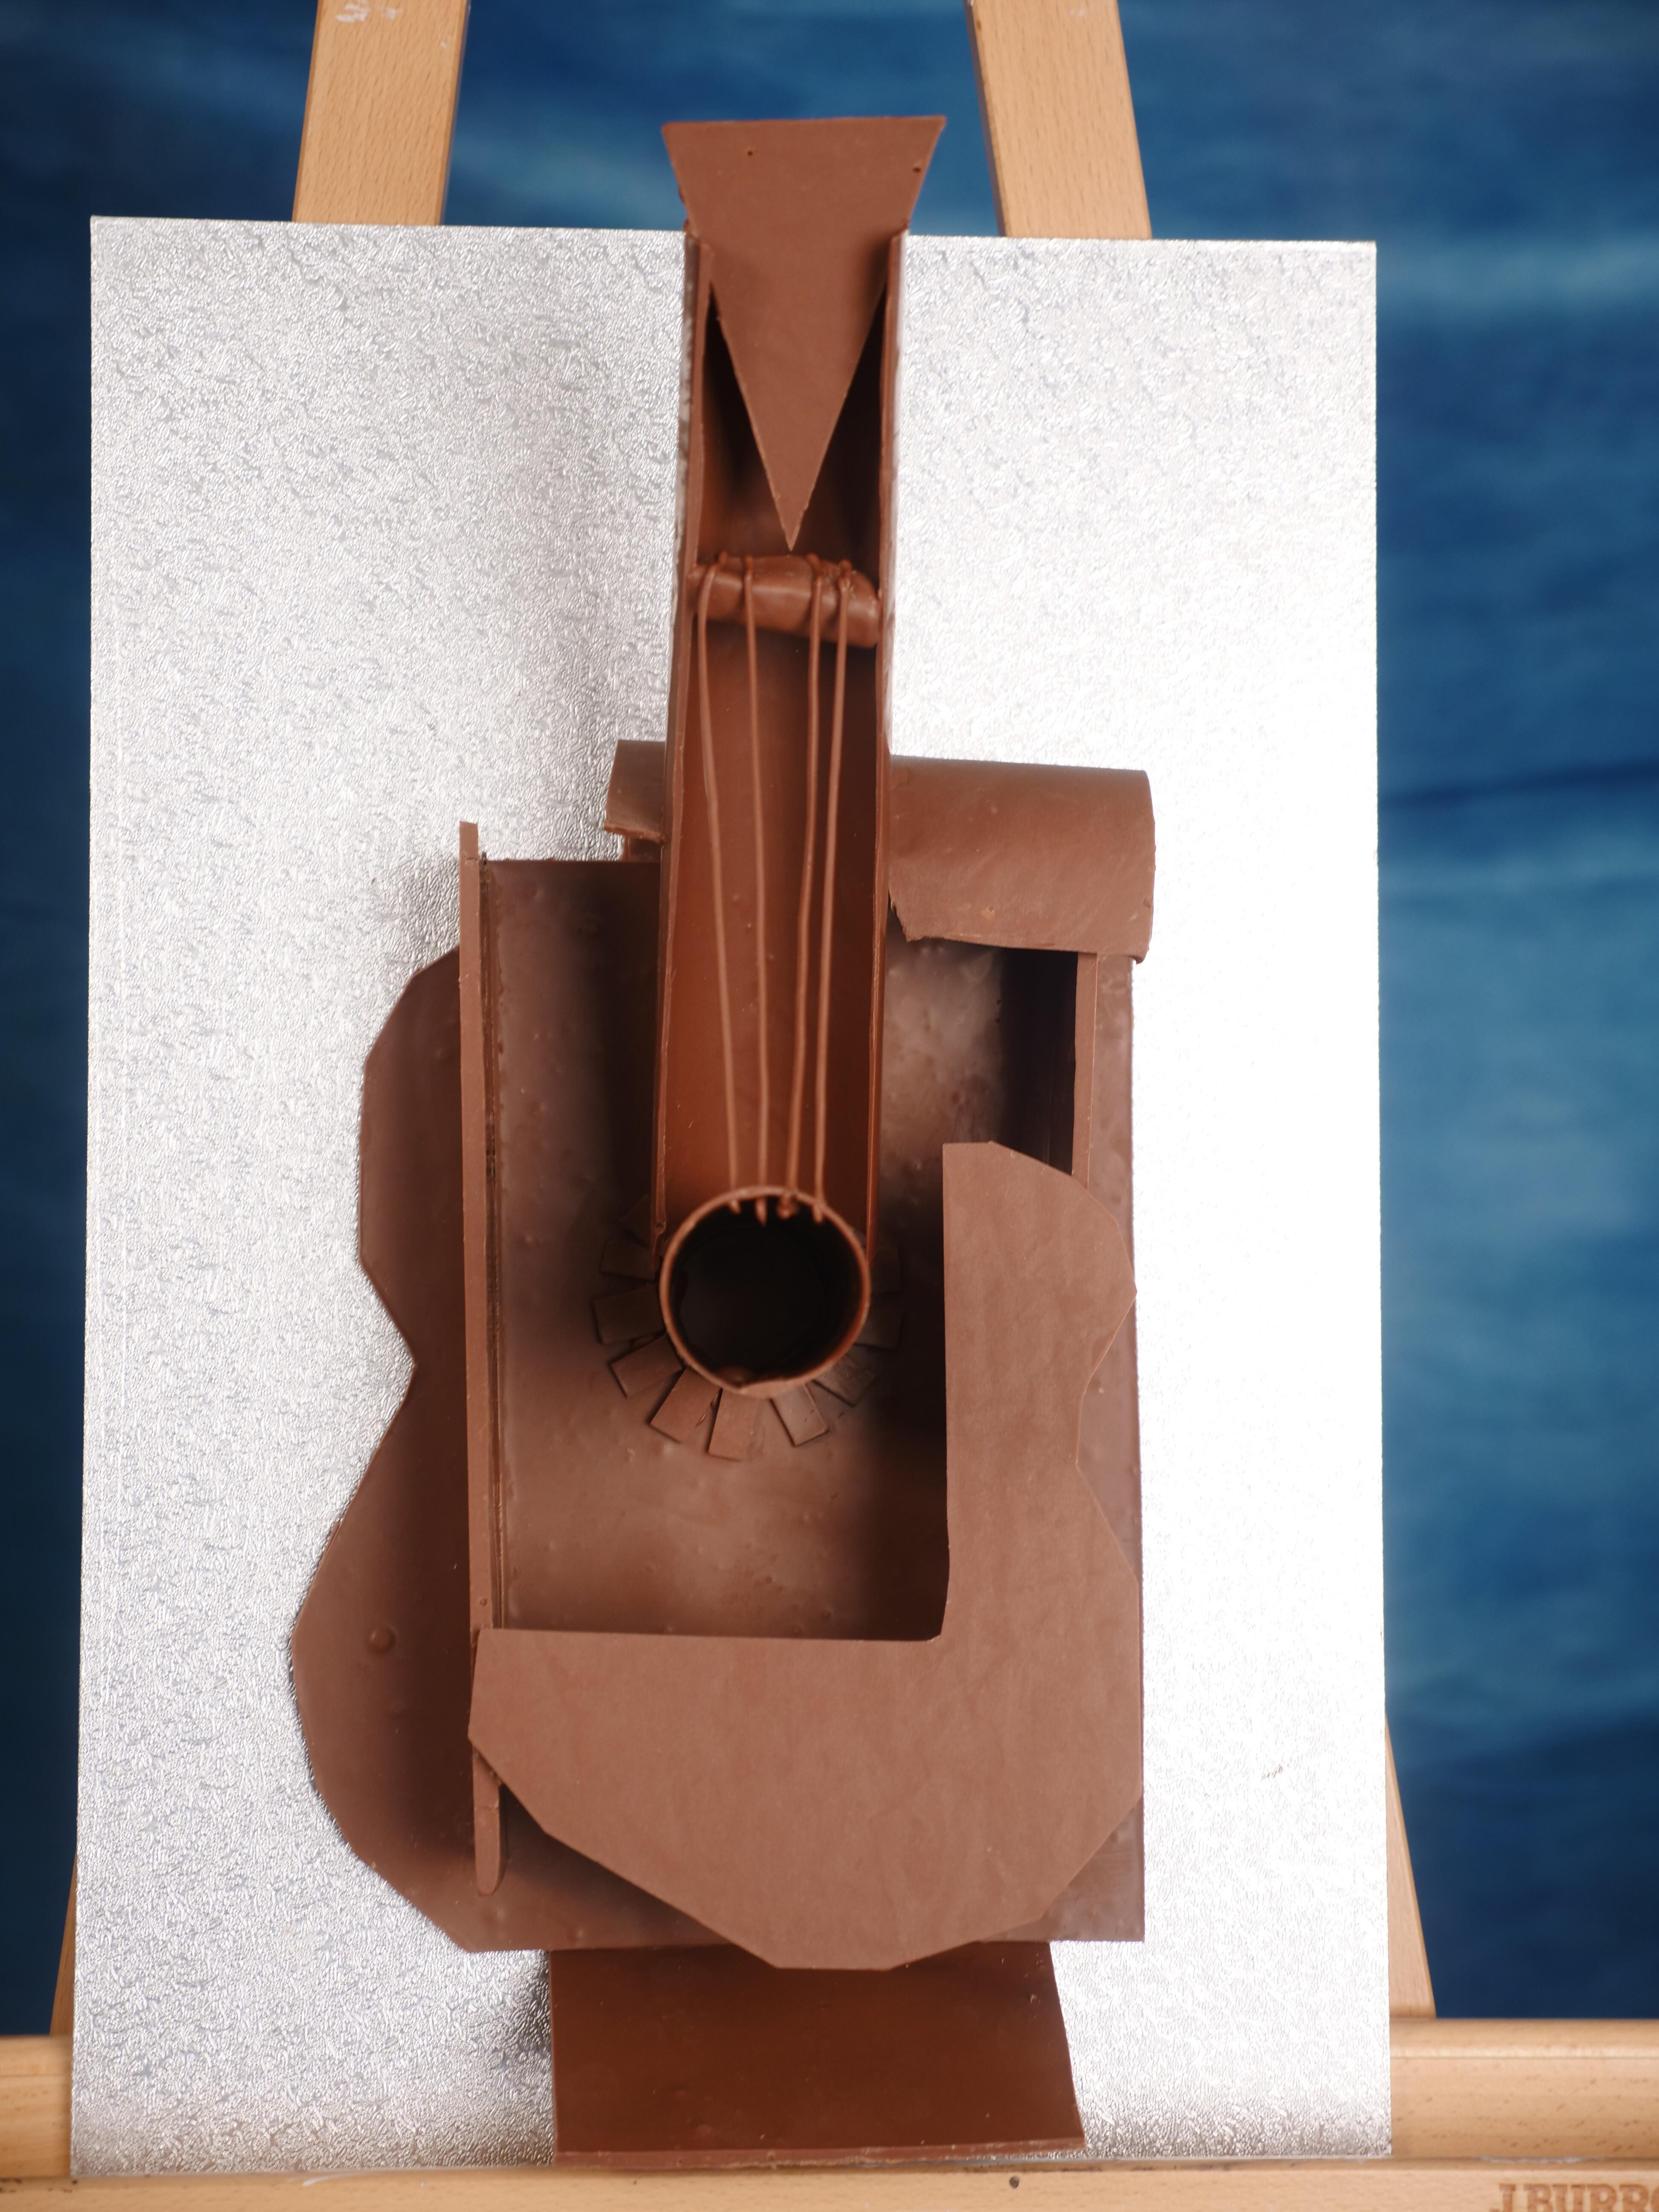 Chocolate Picasso Guitar Sculpture